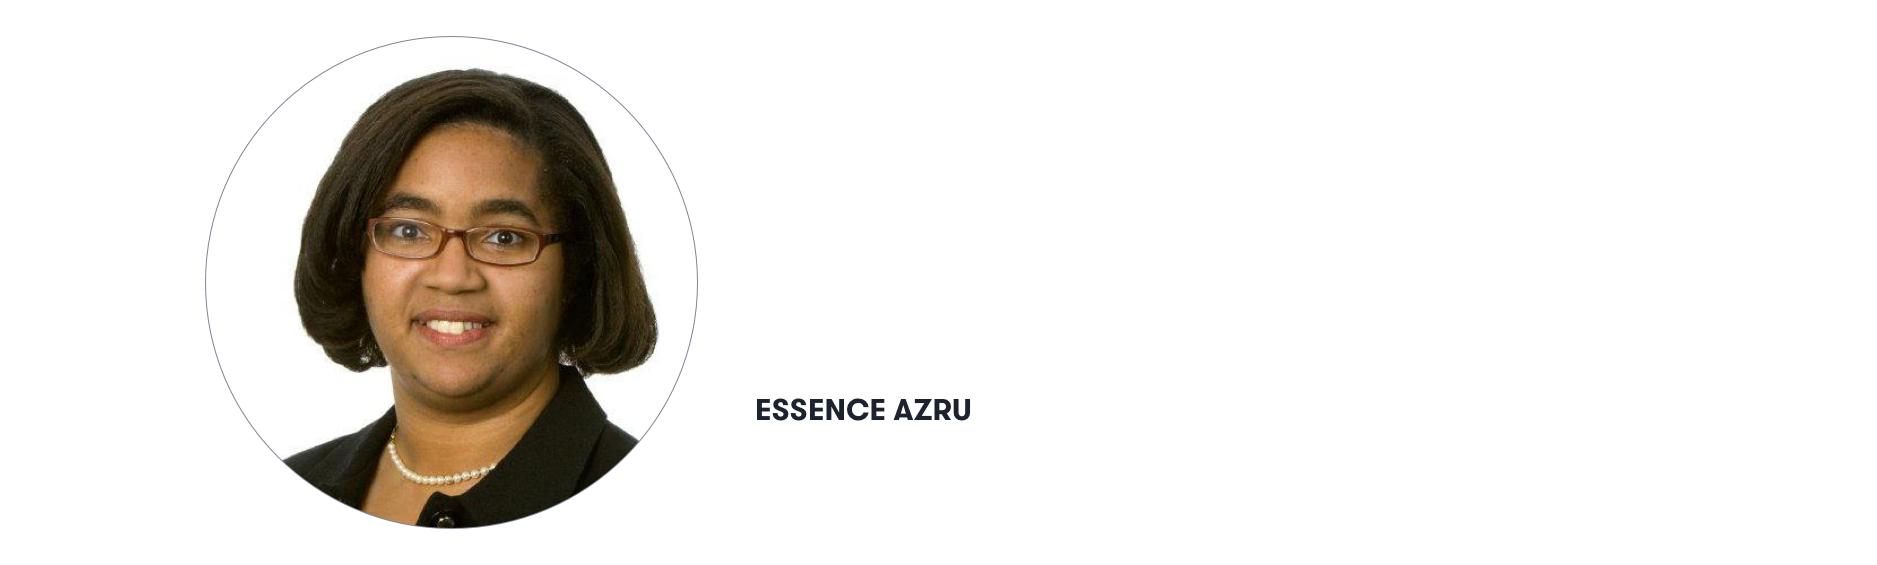 Essence Azru